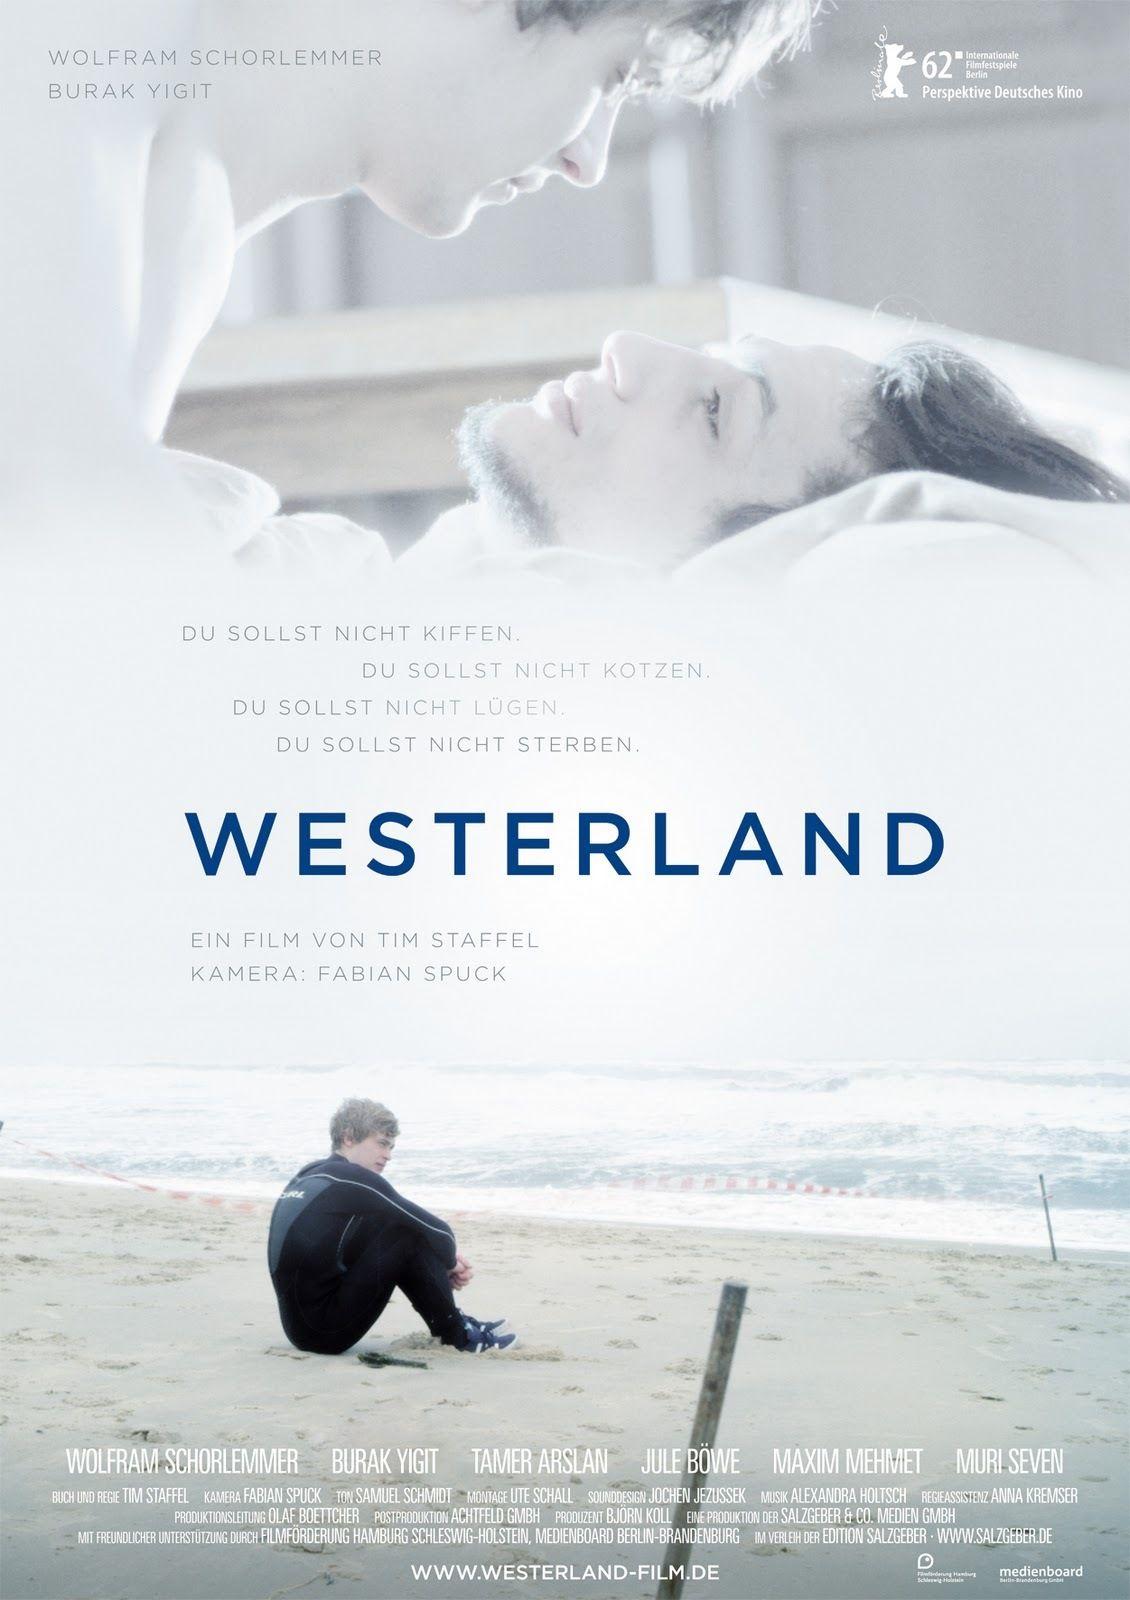 Westerland Film